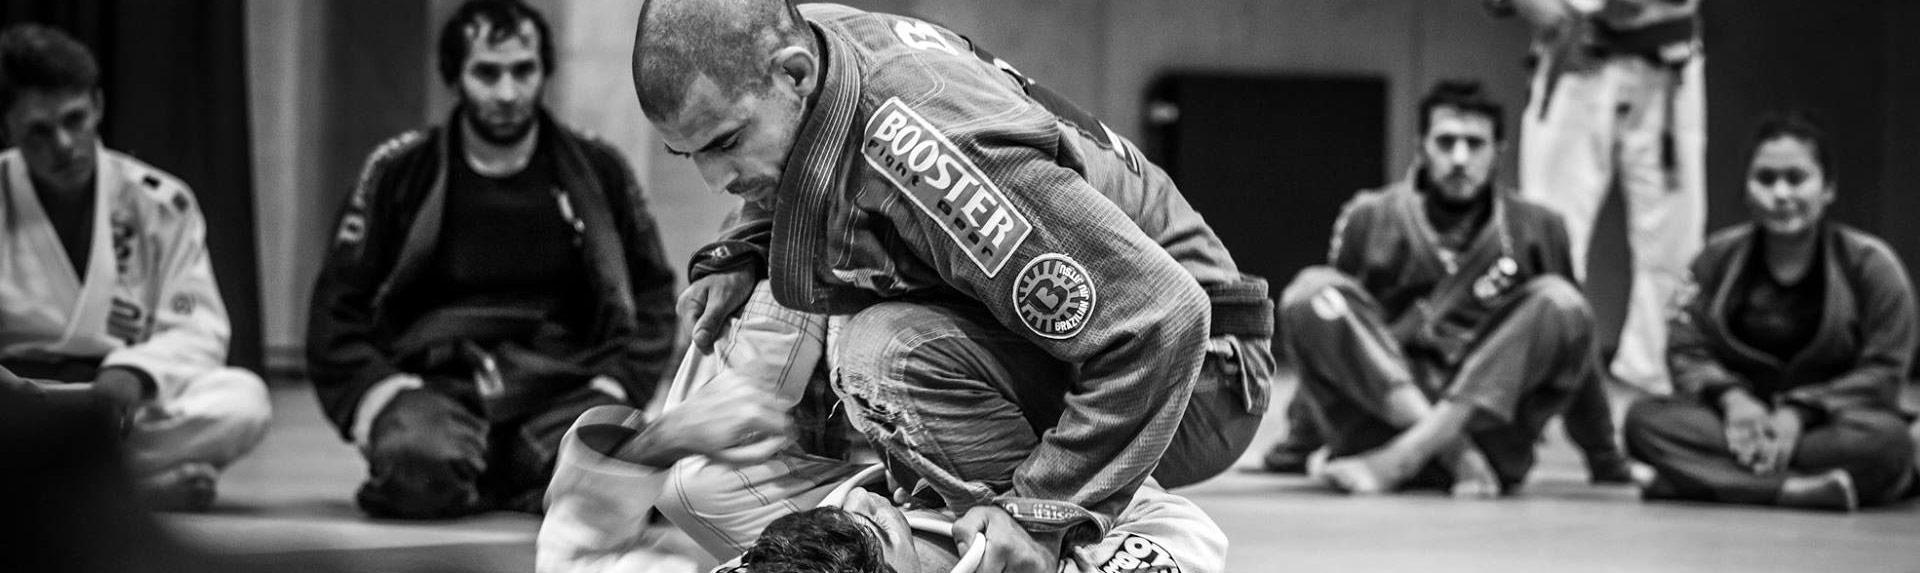 Brasa Brazilian Jiu Jitsu Leuven Belgium Martial Arts Wim Deputter Pressure bjj hero heroes star best coach coaches instructor instructors felipe costa